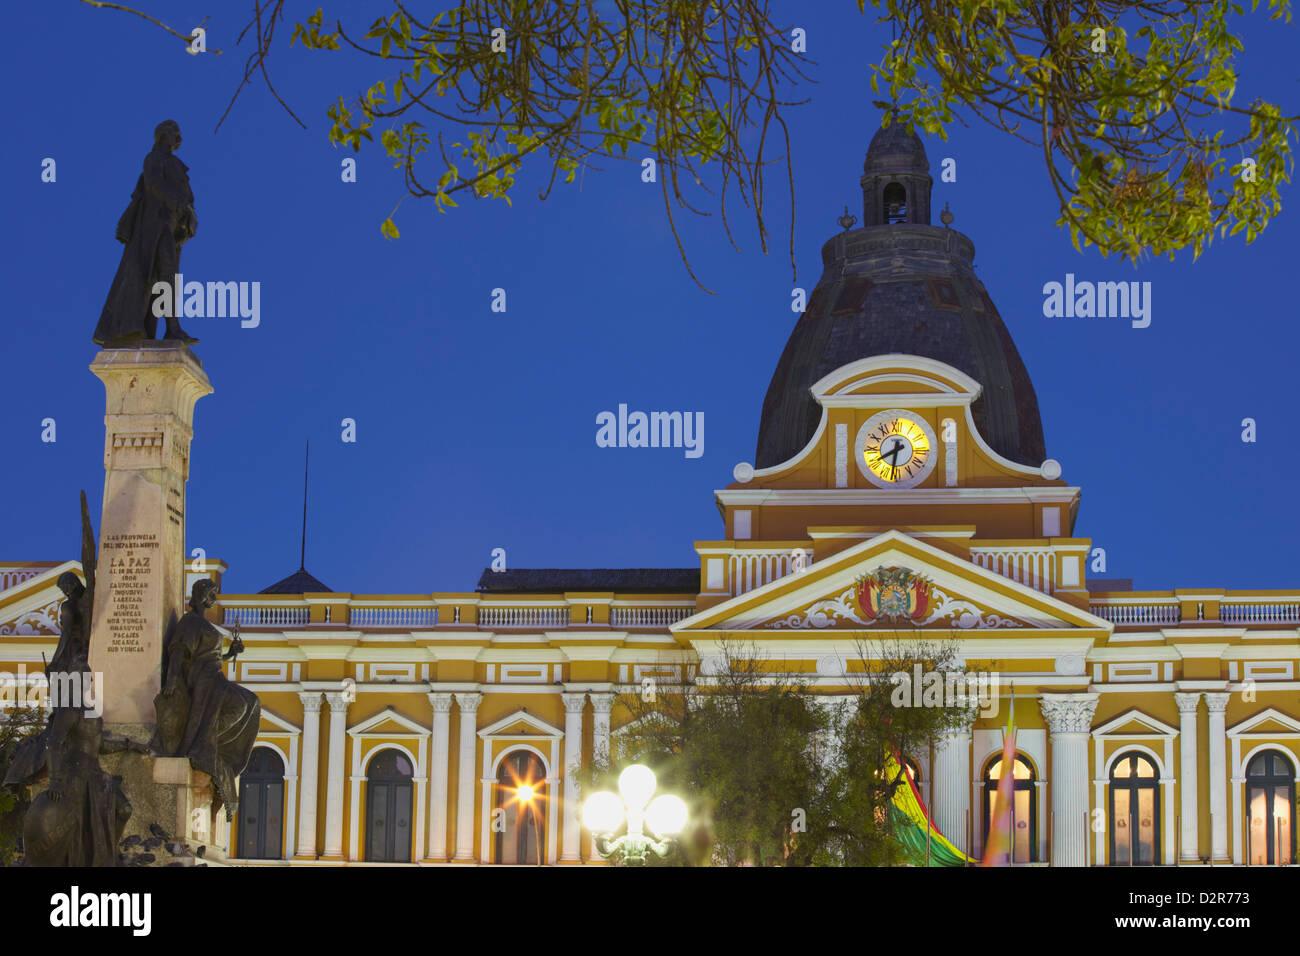 Palacio Legislativo (Legislative Palace) at dusk, La Paz, Bolivia, South America - Stock Image